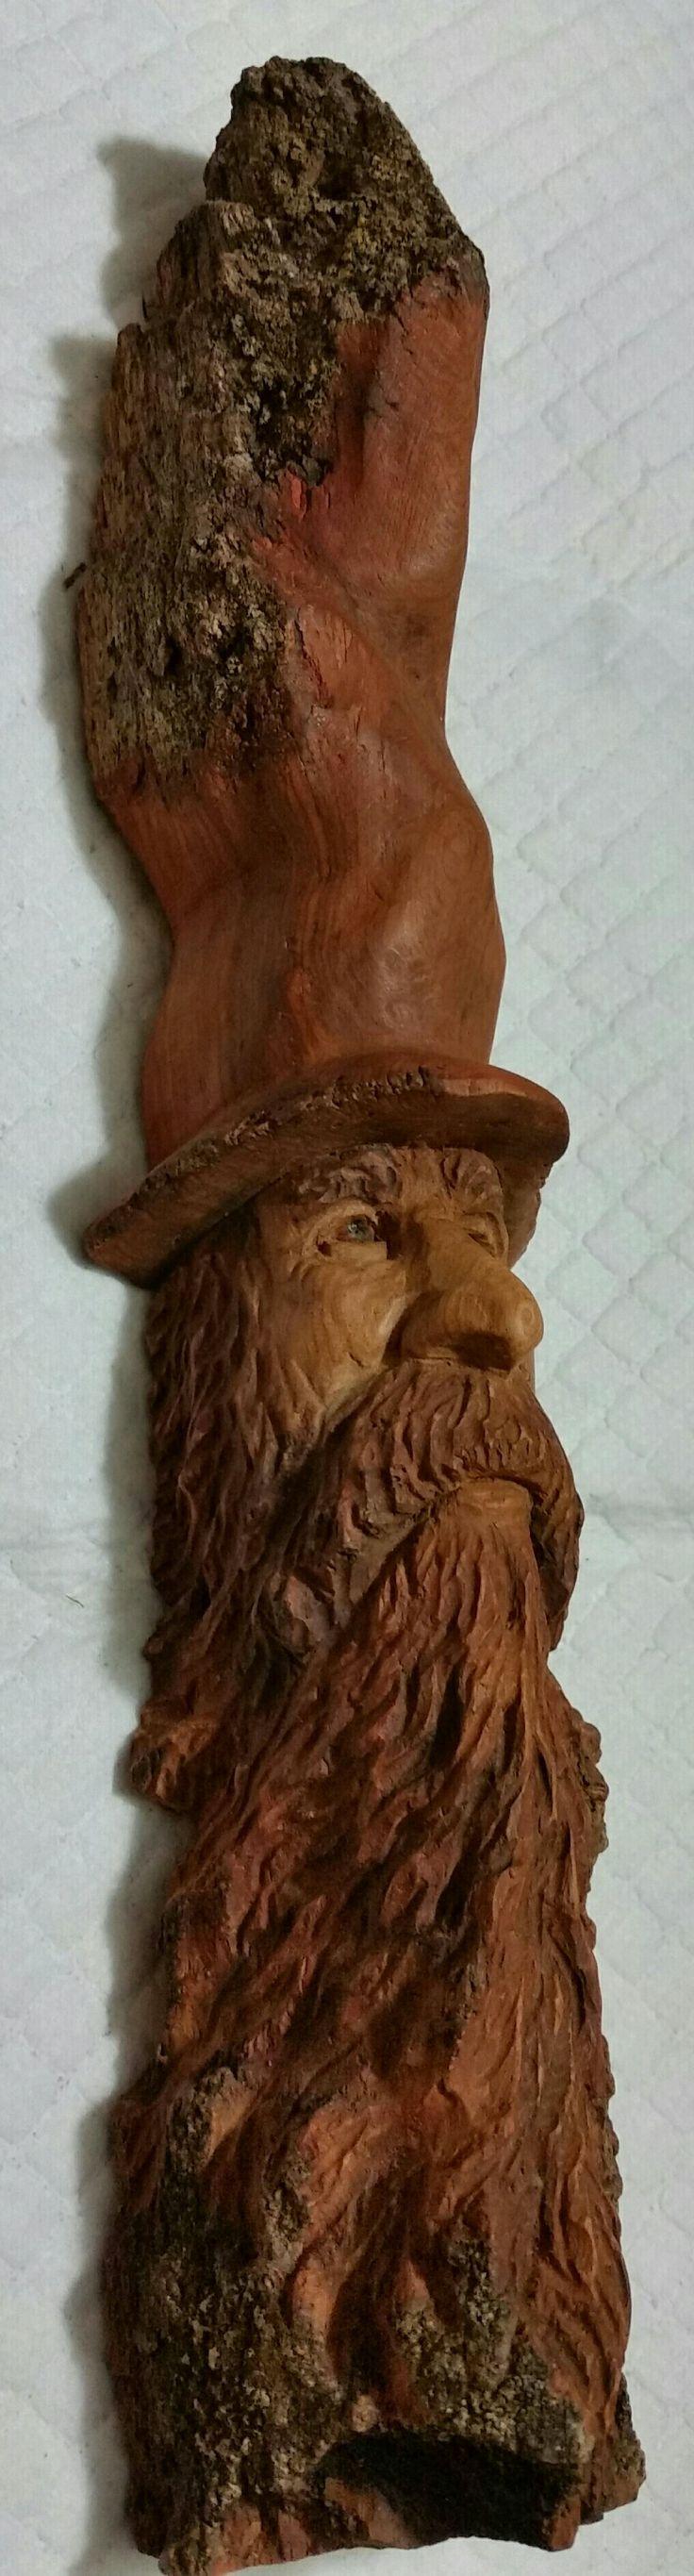 best carvings images on pinterest wood sculpture sculptures